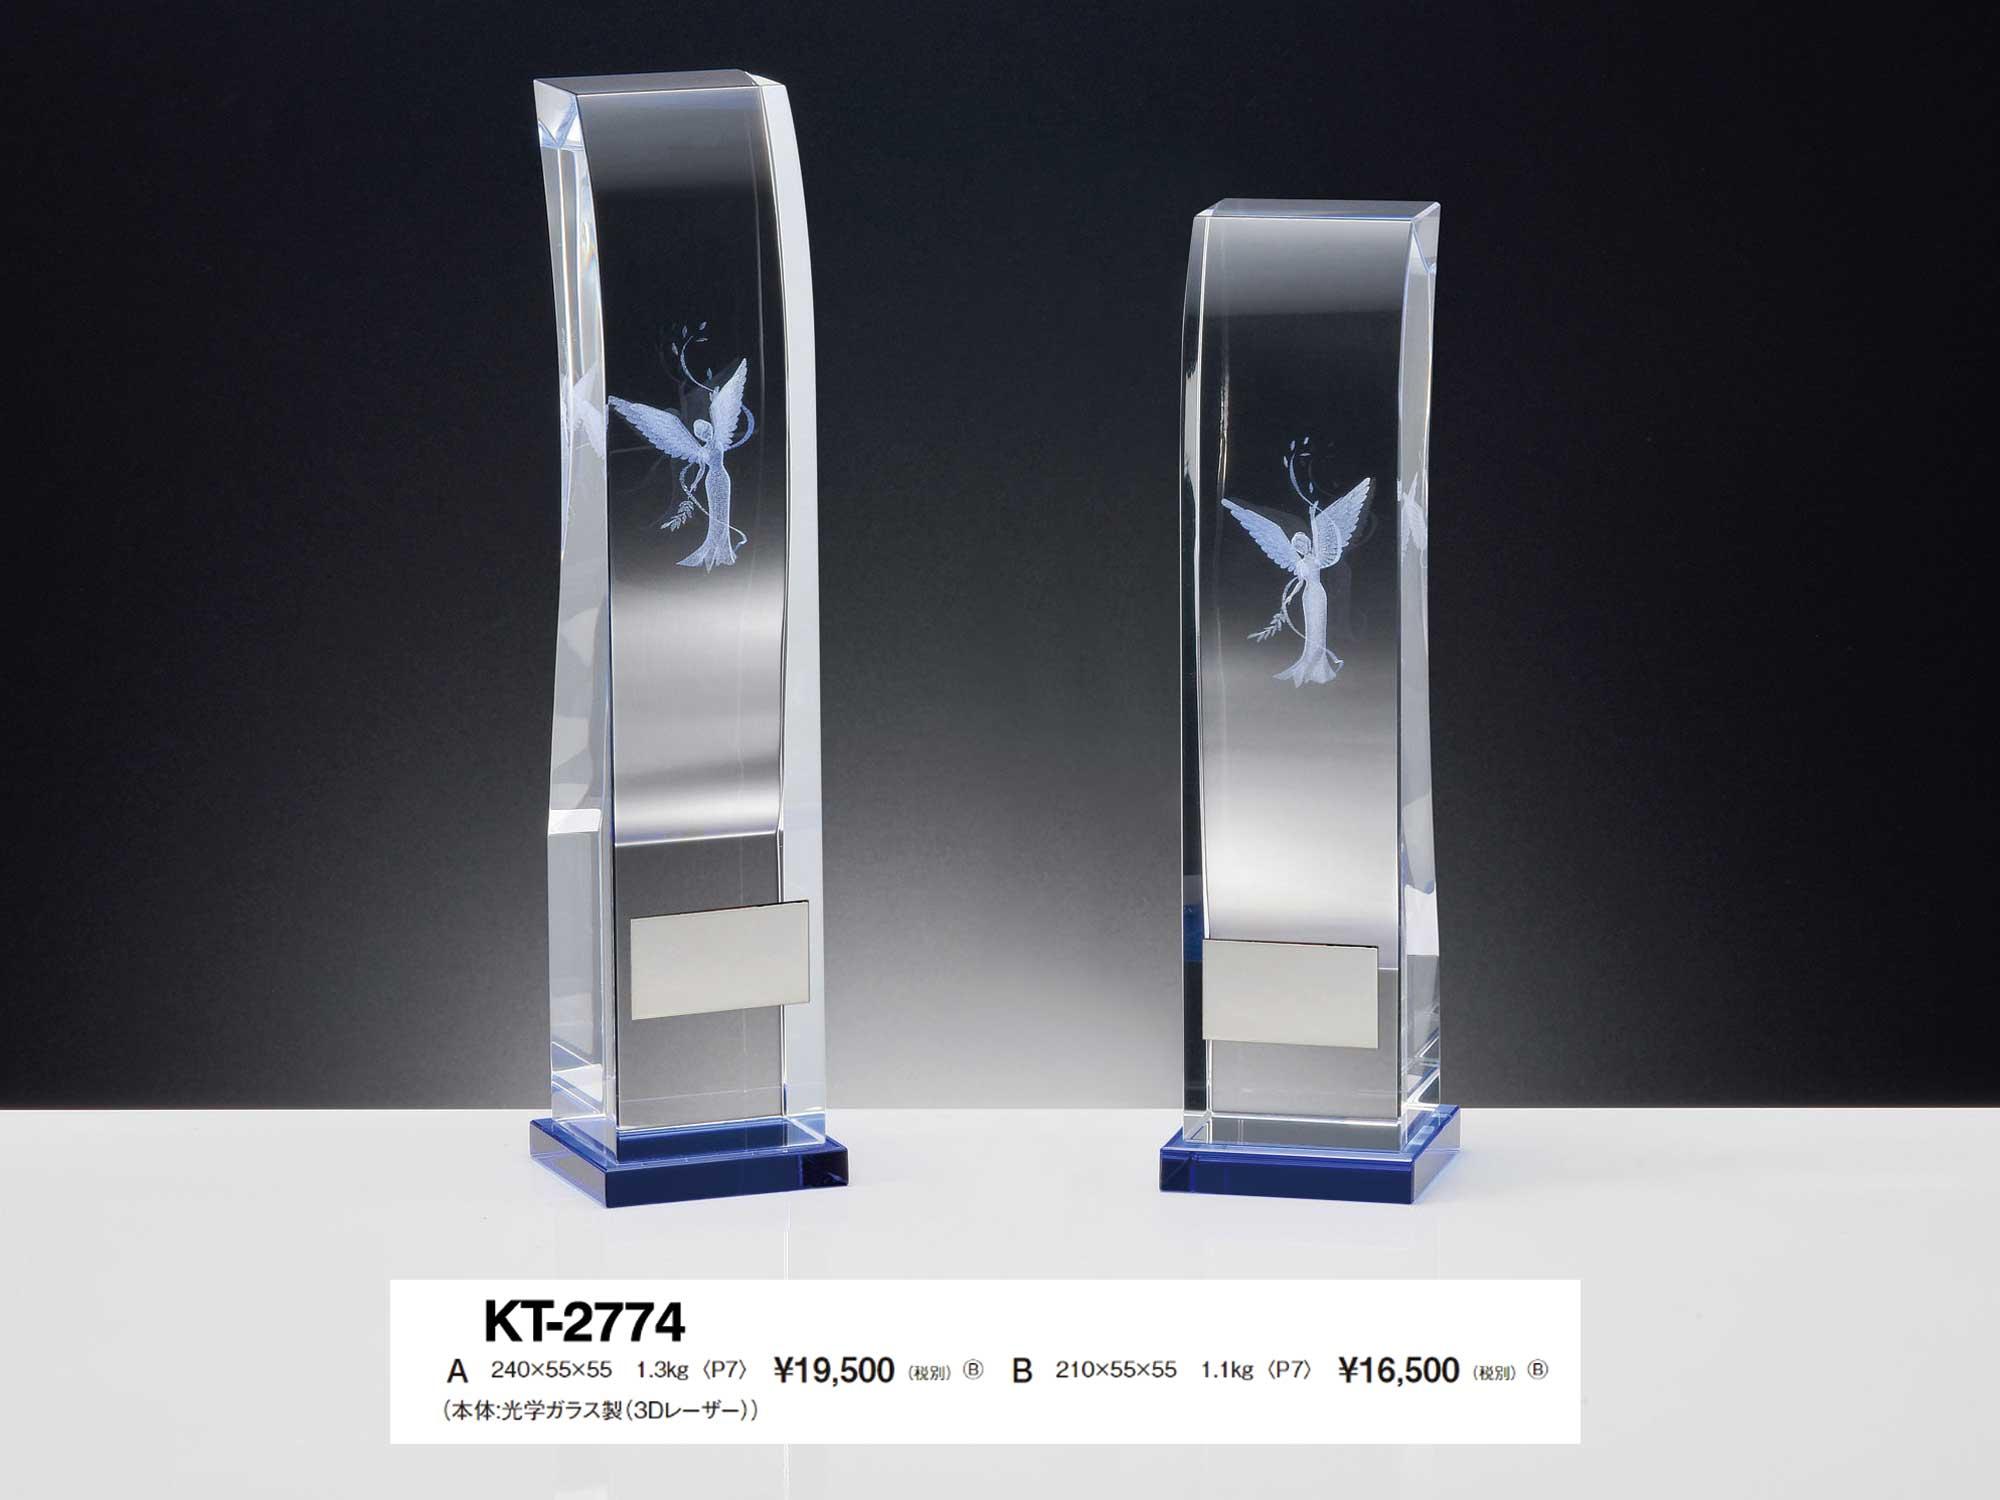 KT2774